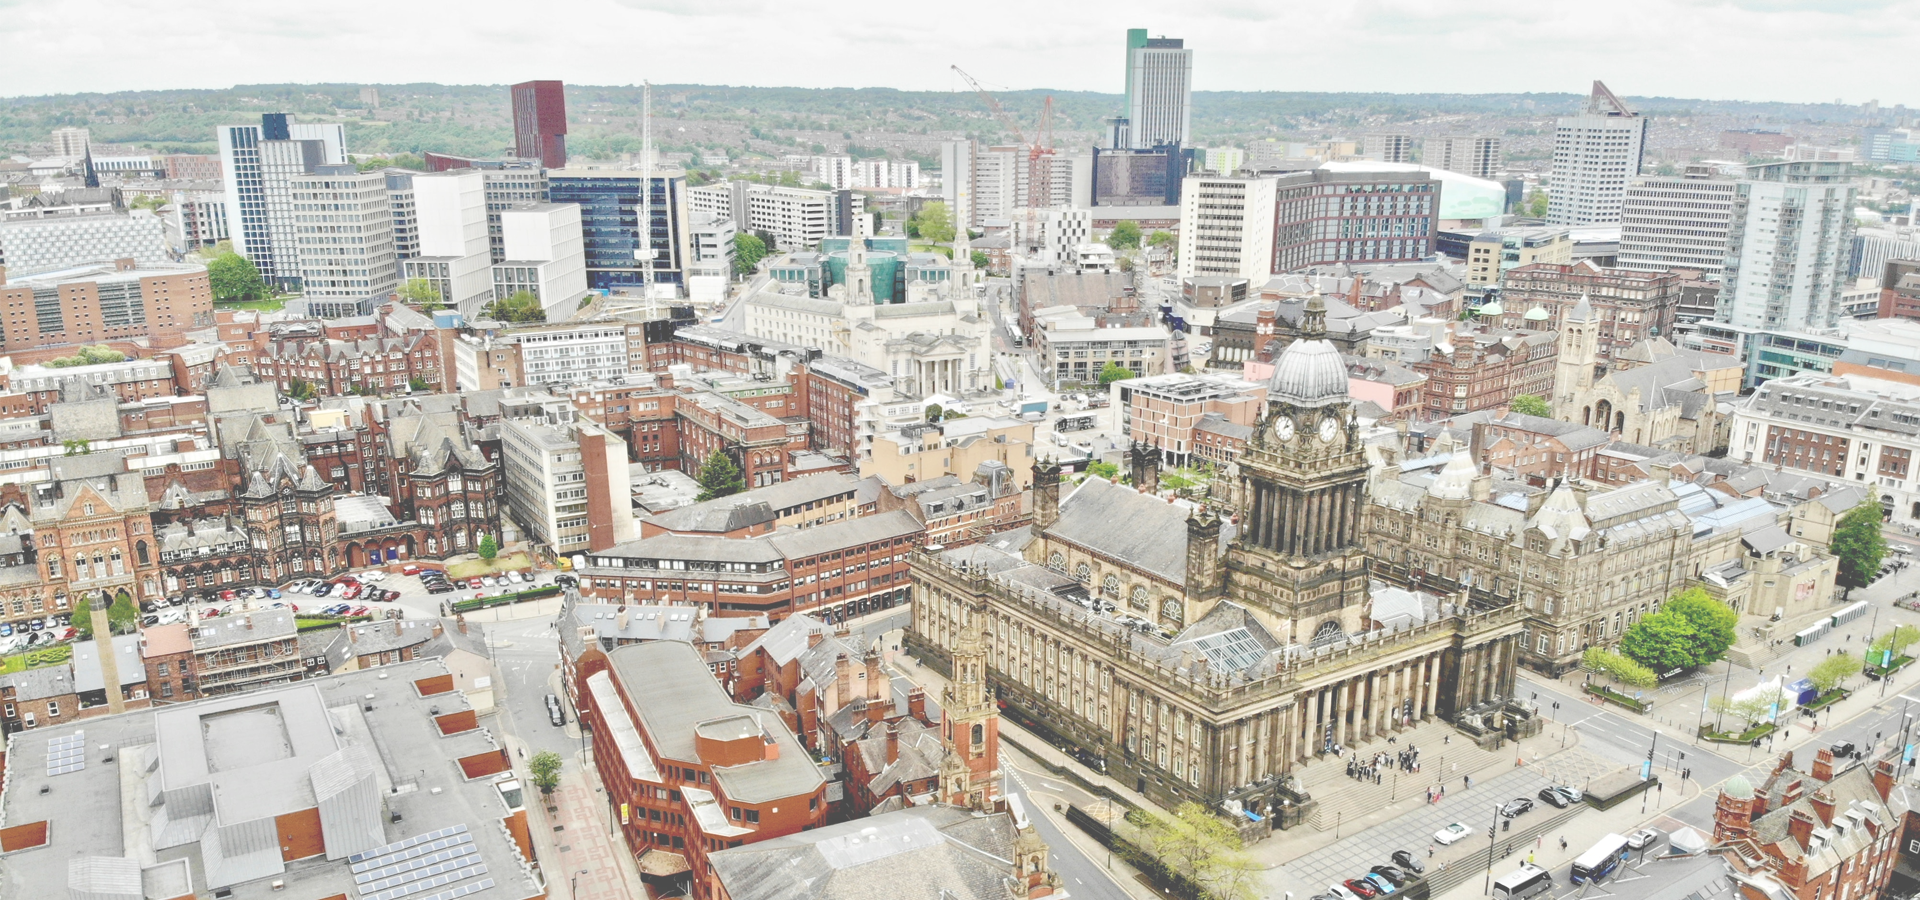 <b>Leeds, West Yorkshire, England, Great Britain</b>